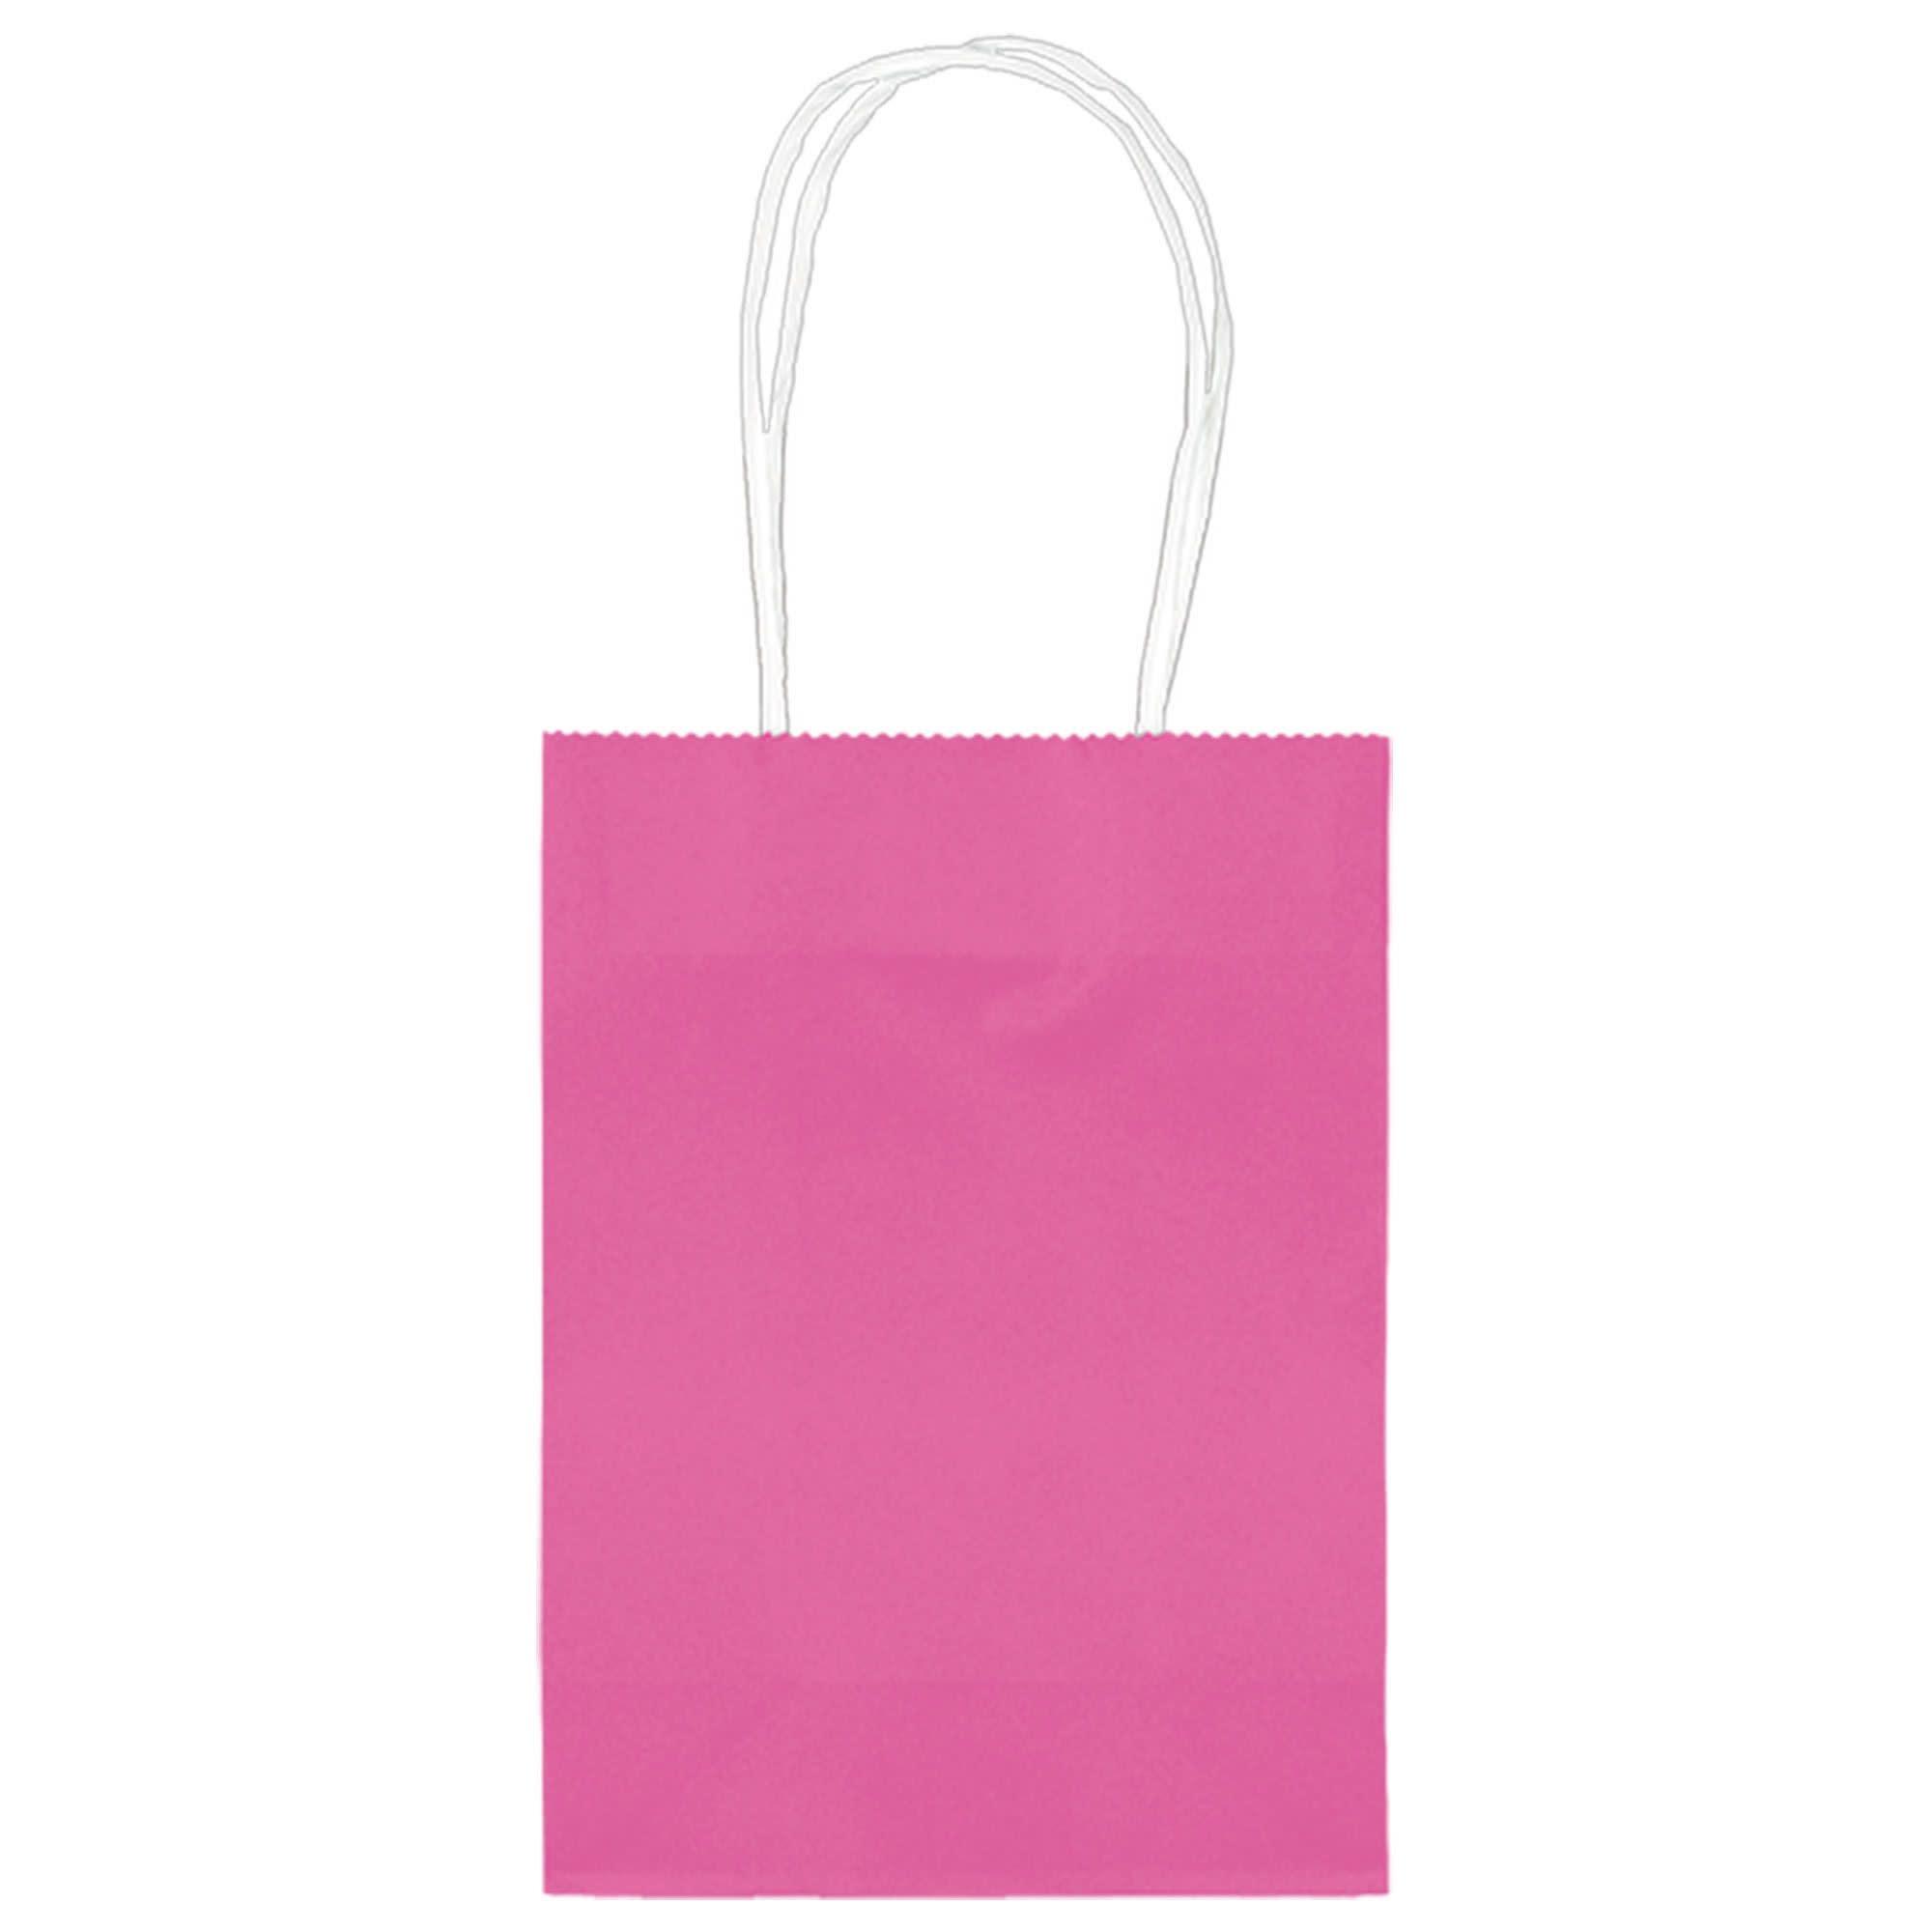 "5"" Kraft Bag - Bright Pink"